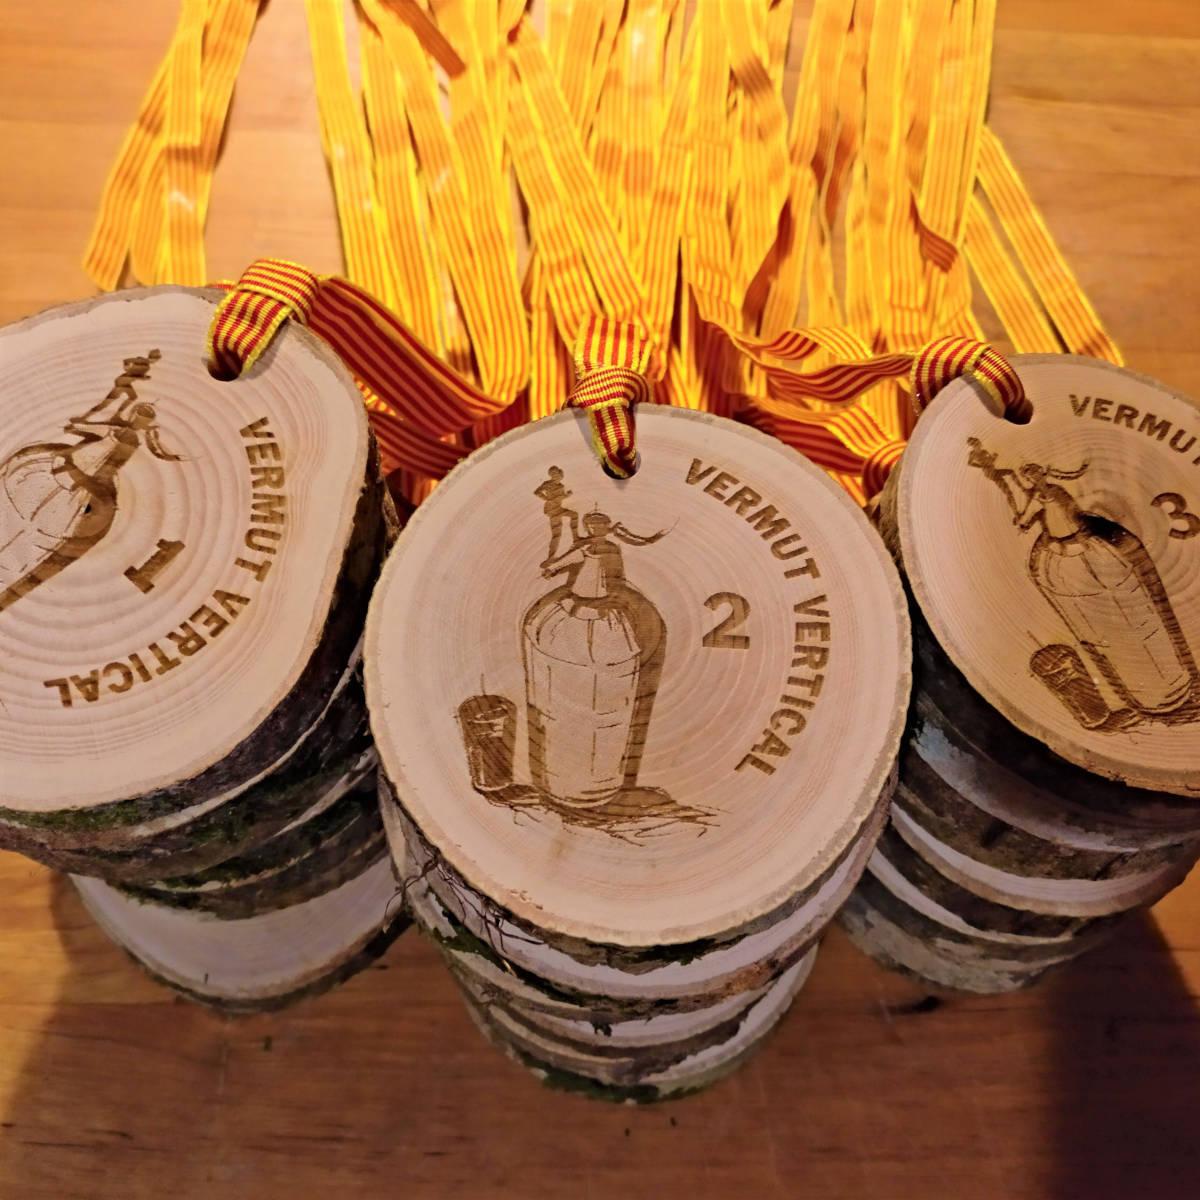 Medalla fusta Vermuts Verticals